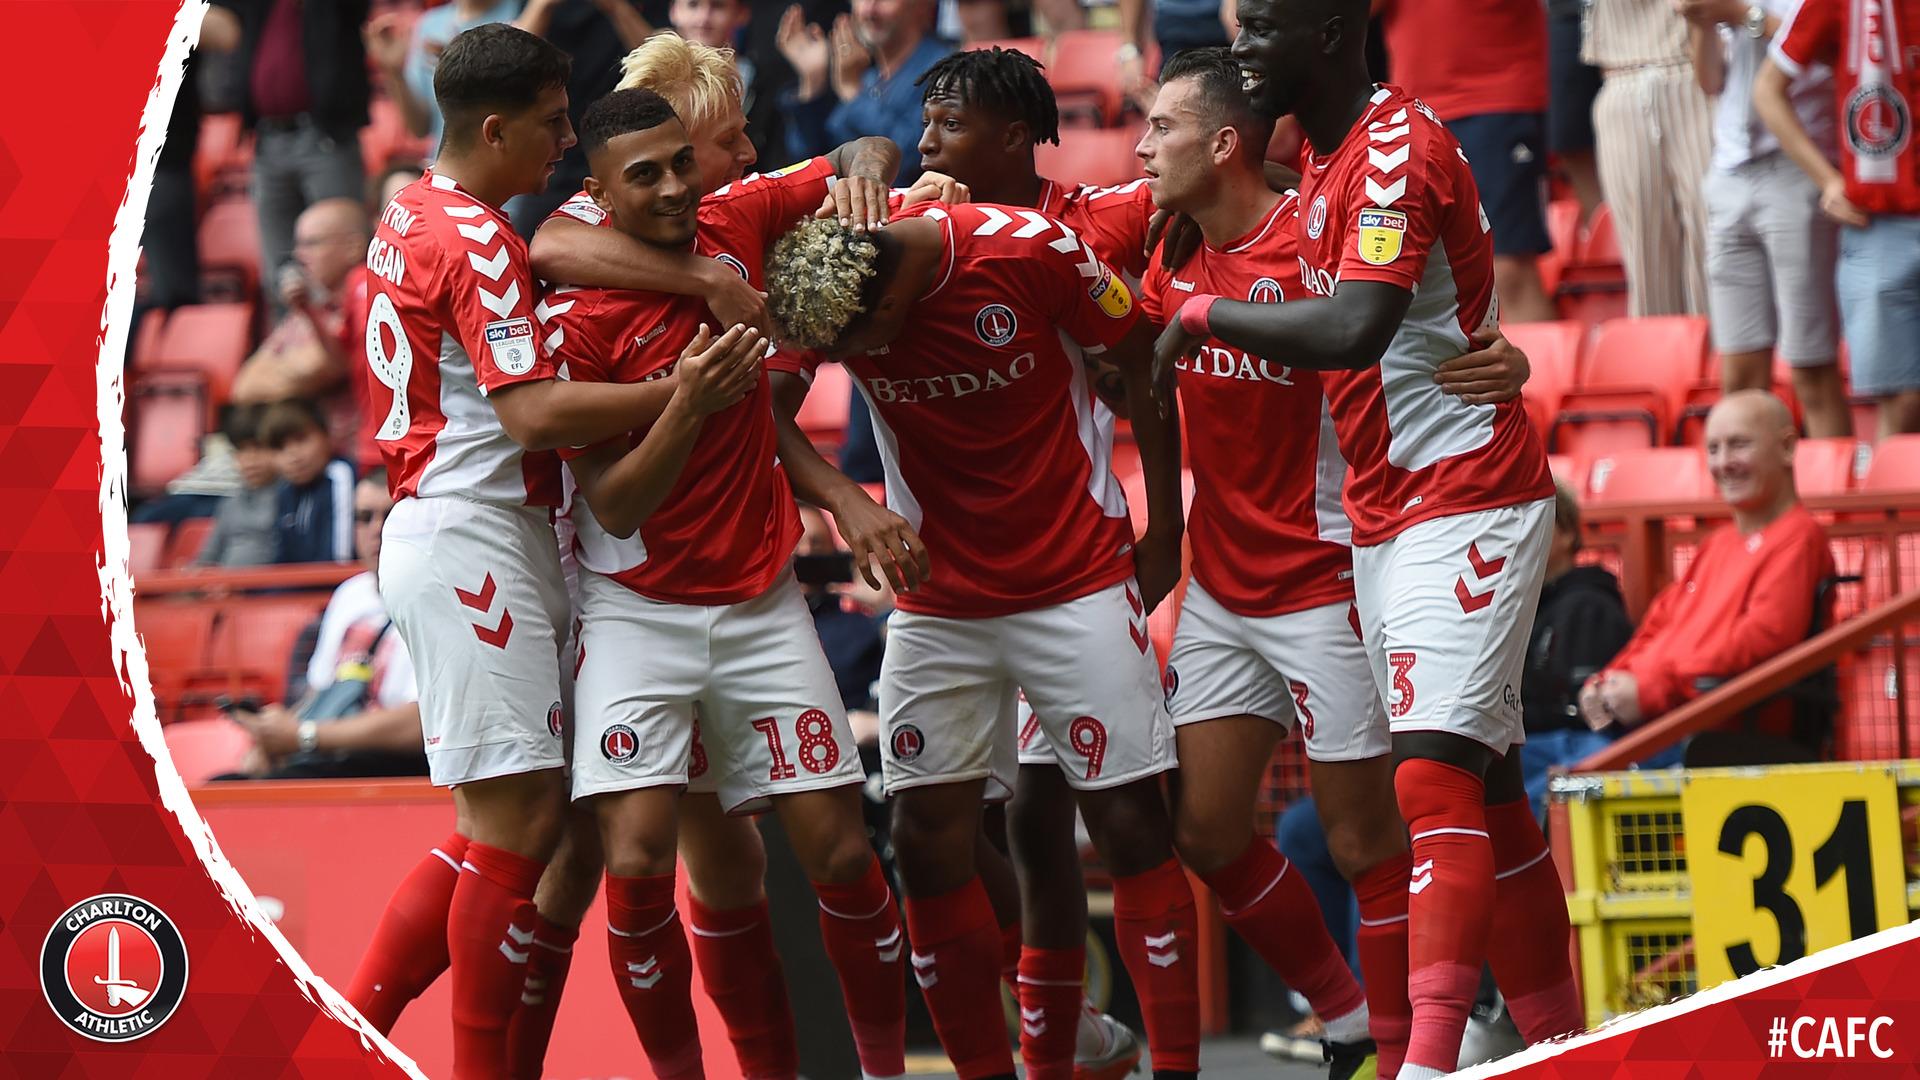 FULL GAME | Charlton 2 Shrewsbury 1 (Aug 2018)